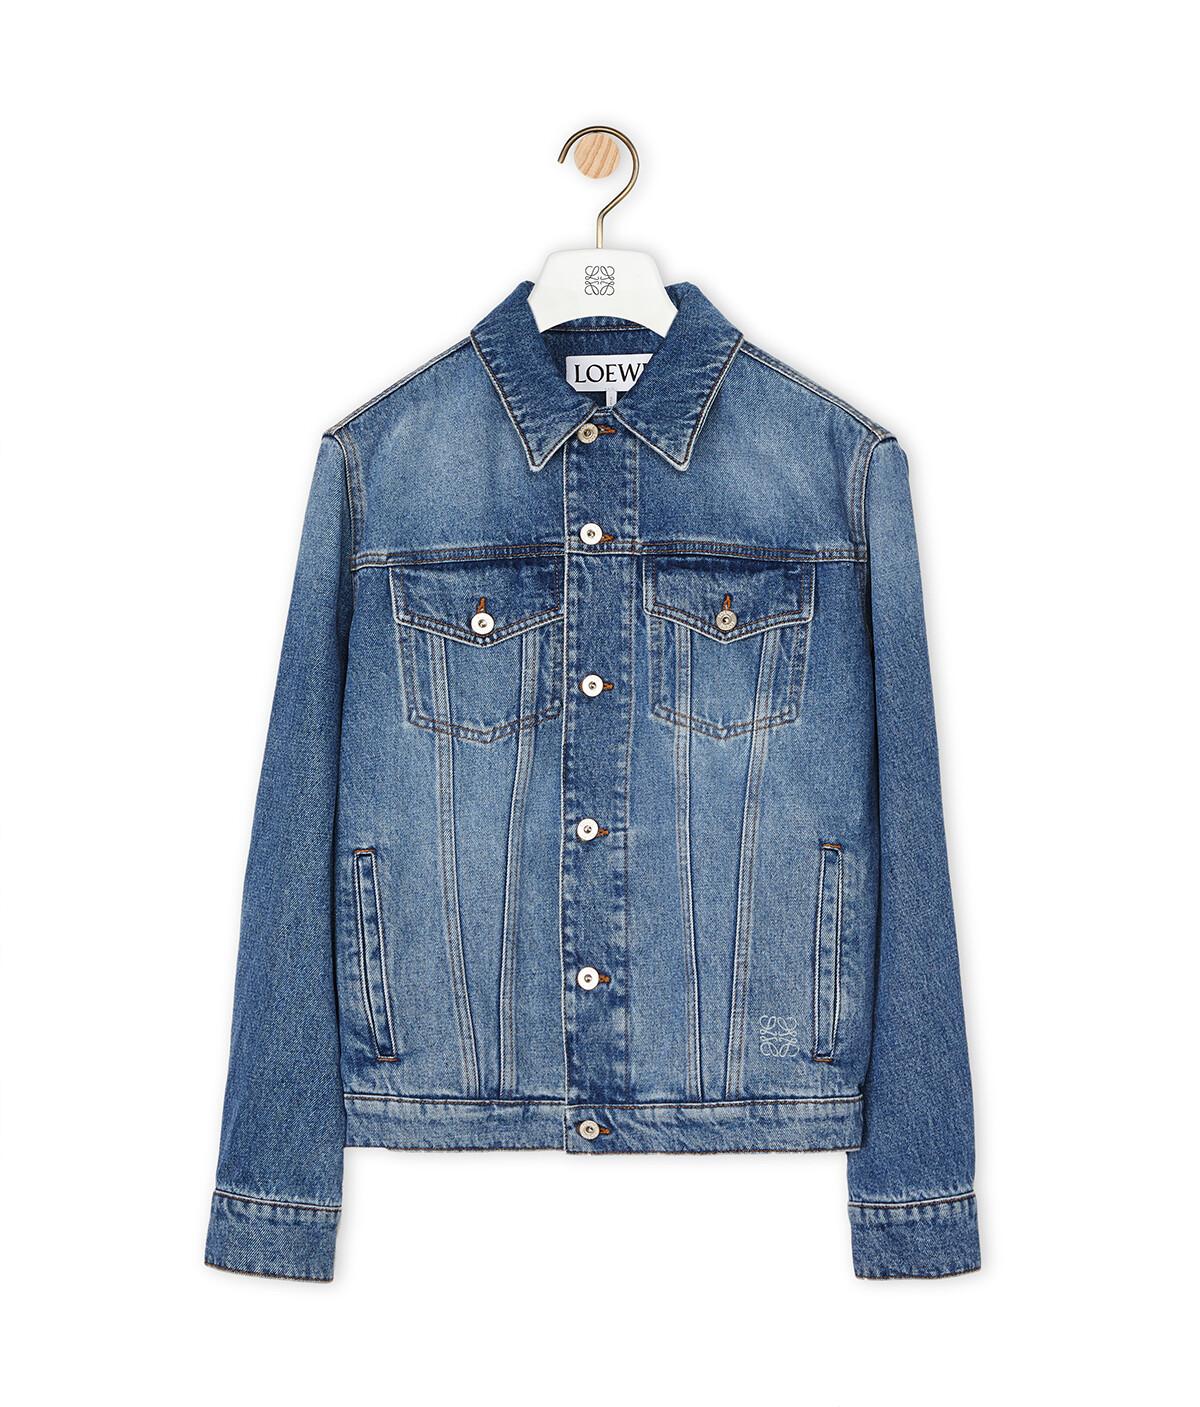 LOEWE Denim Jacket Blue front